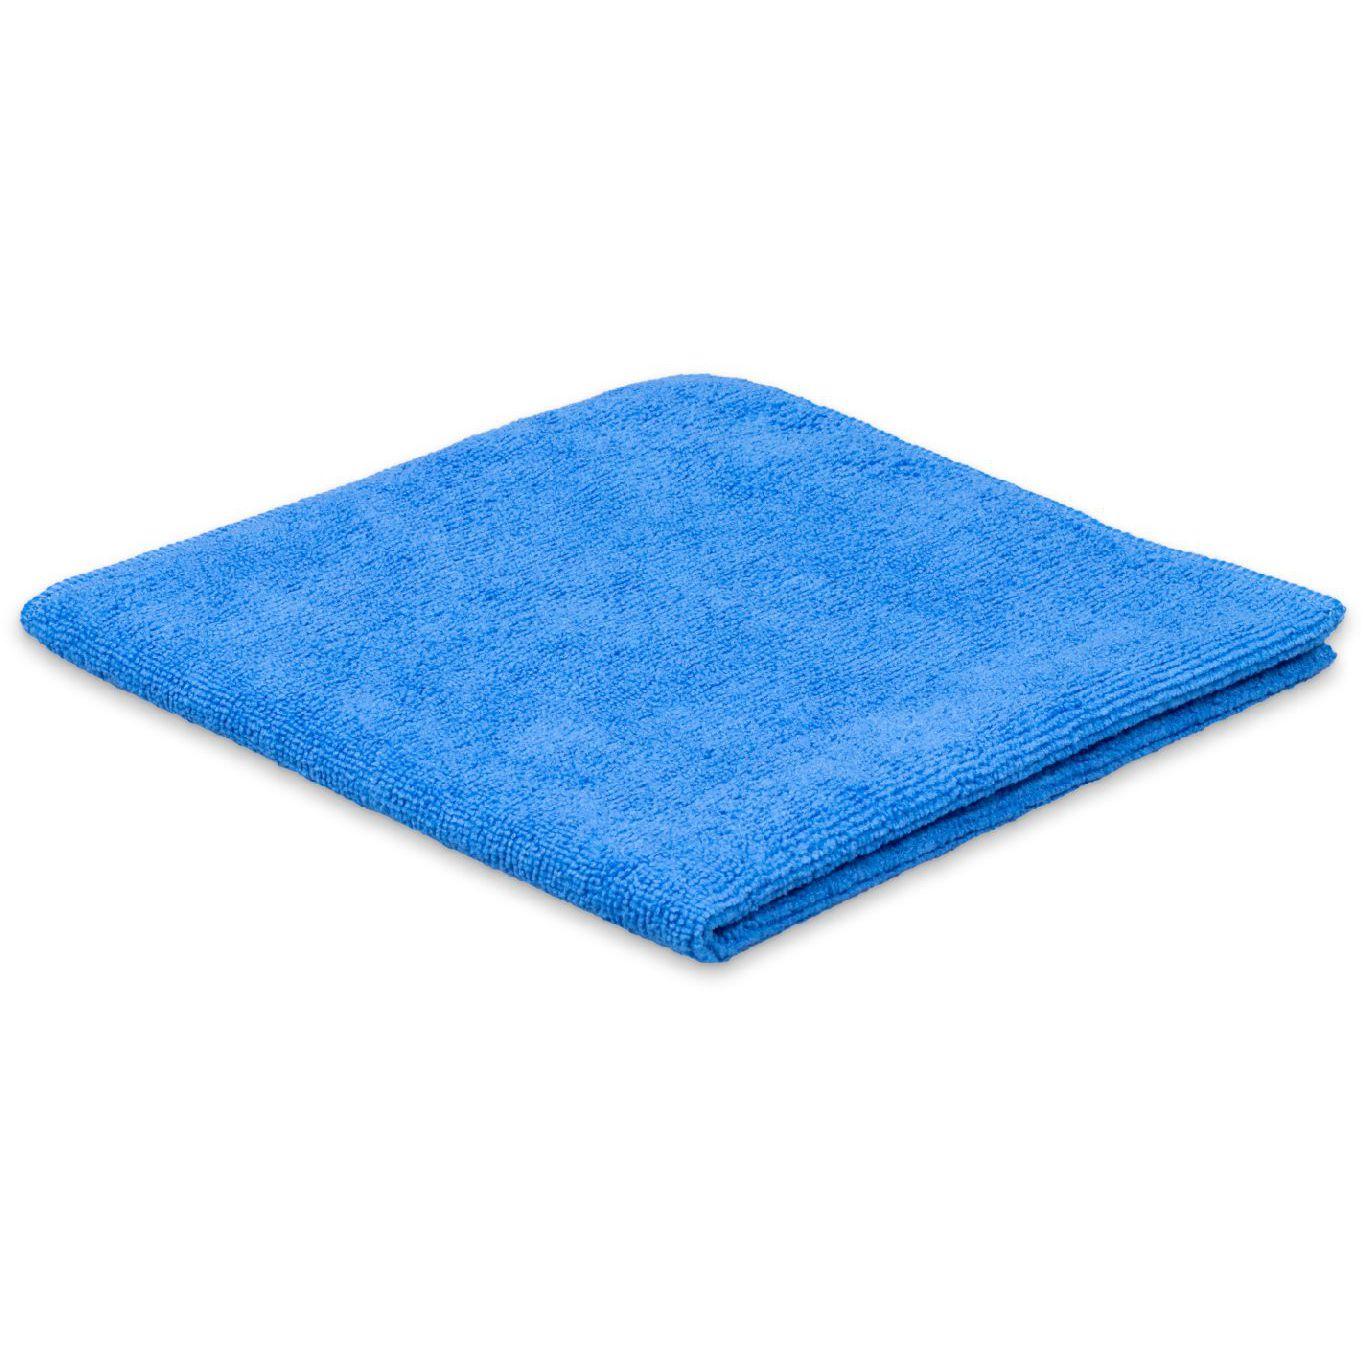 seidel_tuecher_tricot-soft-40-x-40-cm-blau